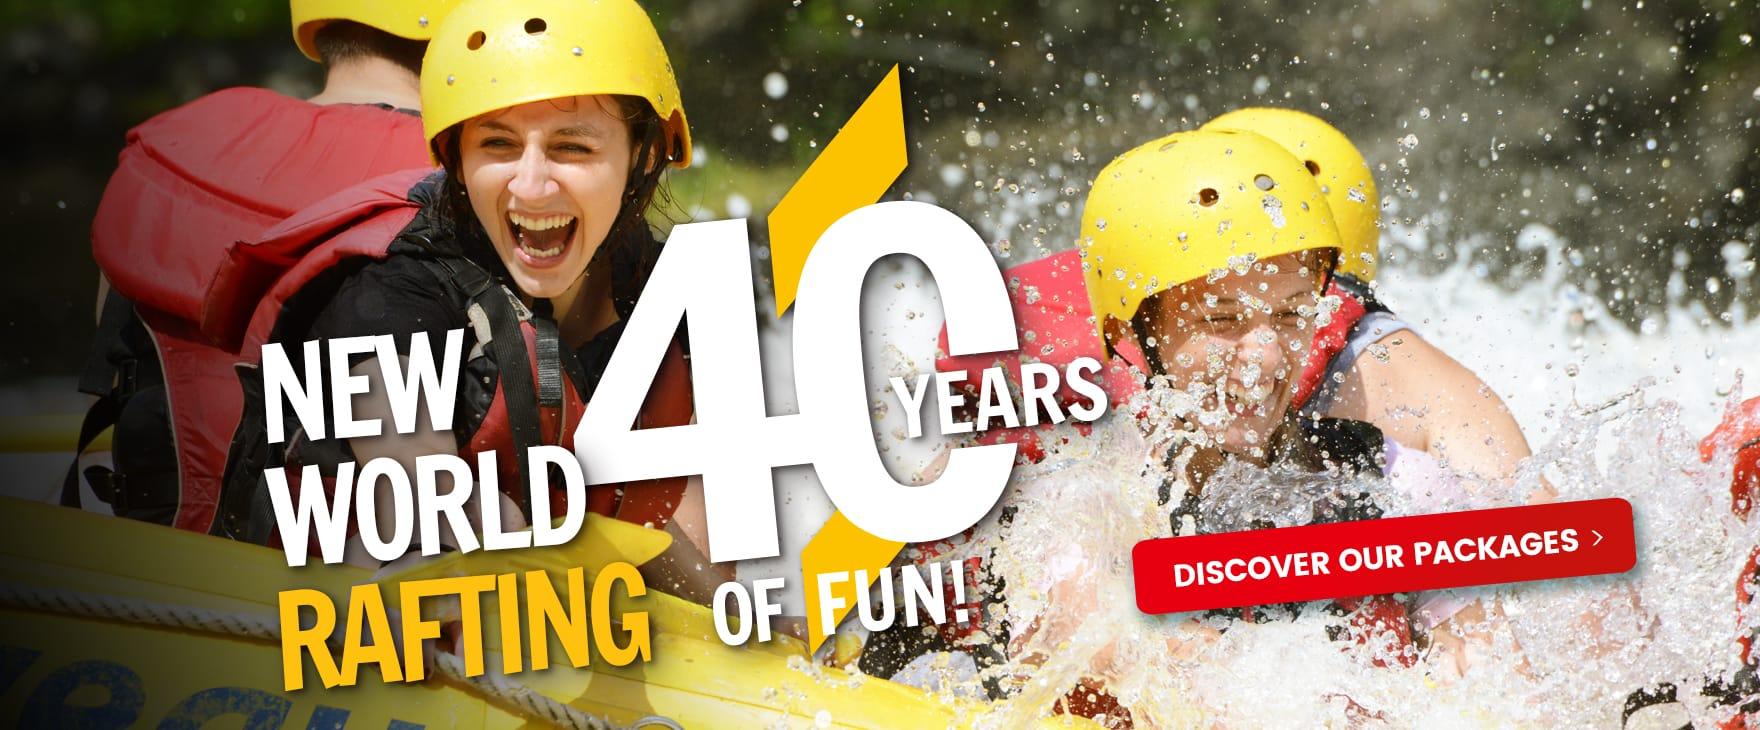 New World Rafting | It's 40 years of fun!